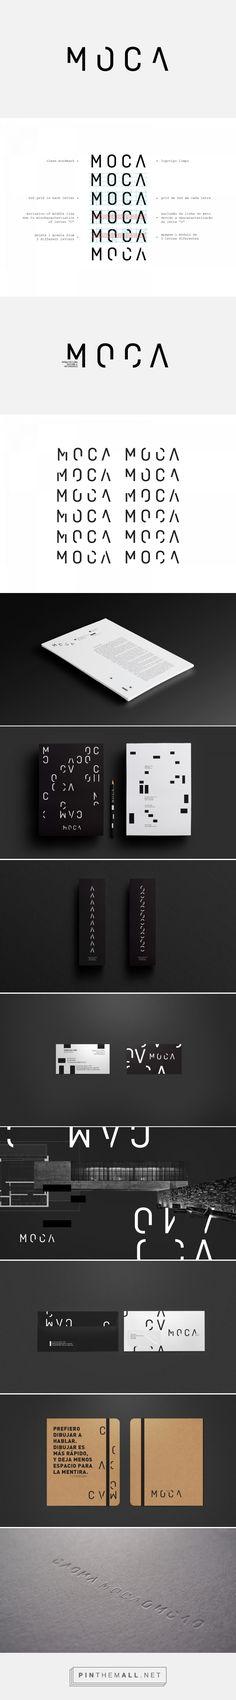 MOCA Re-Branding by miligrama design